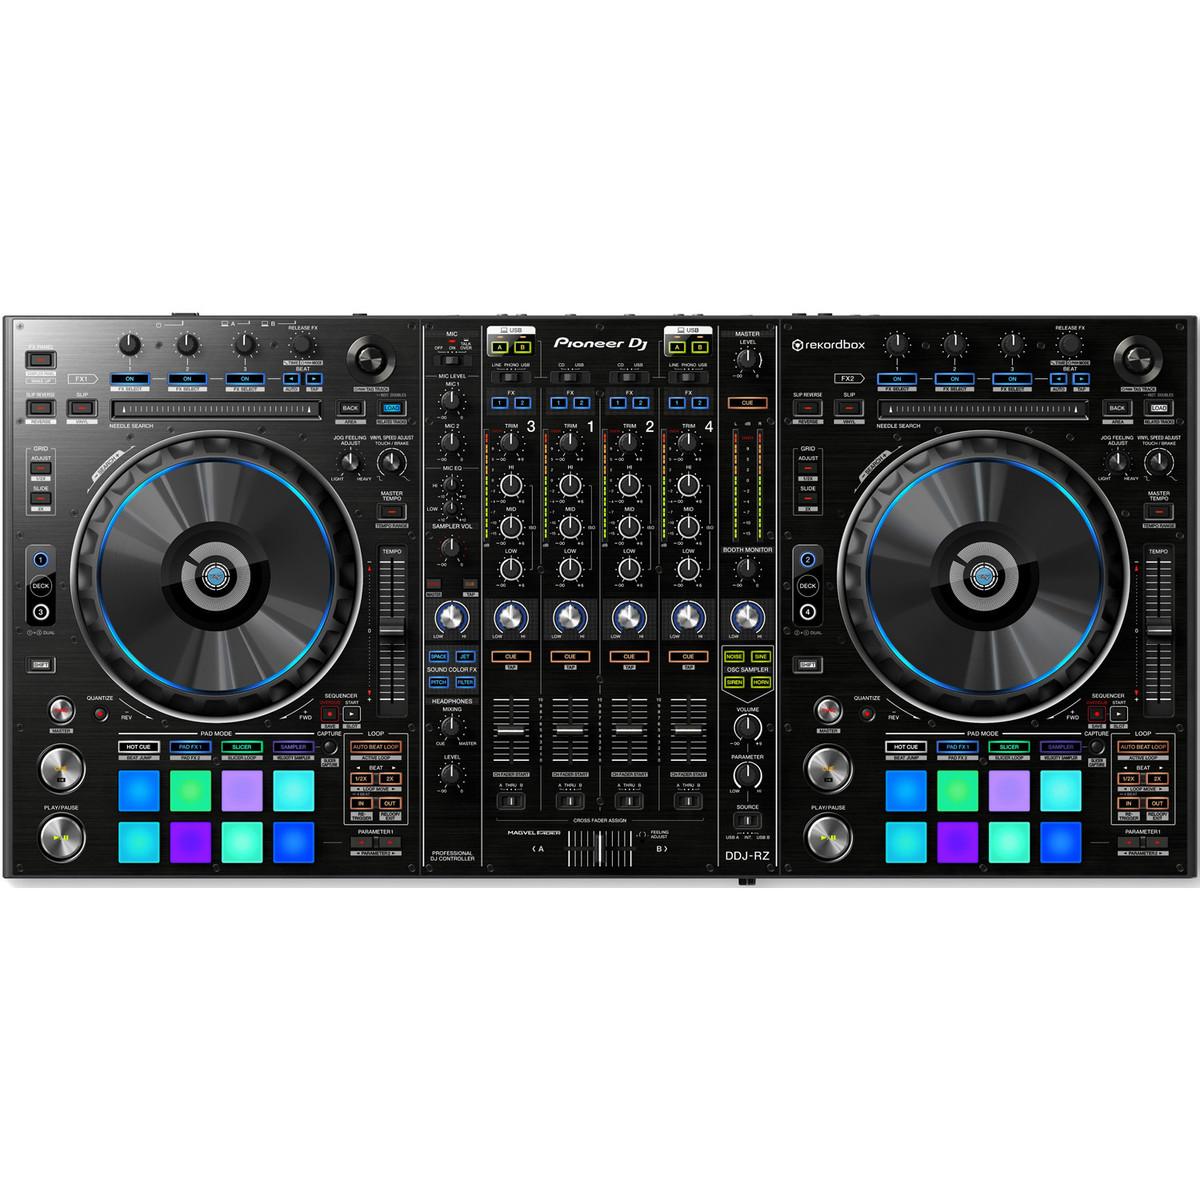 pioneer ddj rz professional dj controller at gear4music. Black Bedroom Furniture Sets. Home Design Ideas